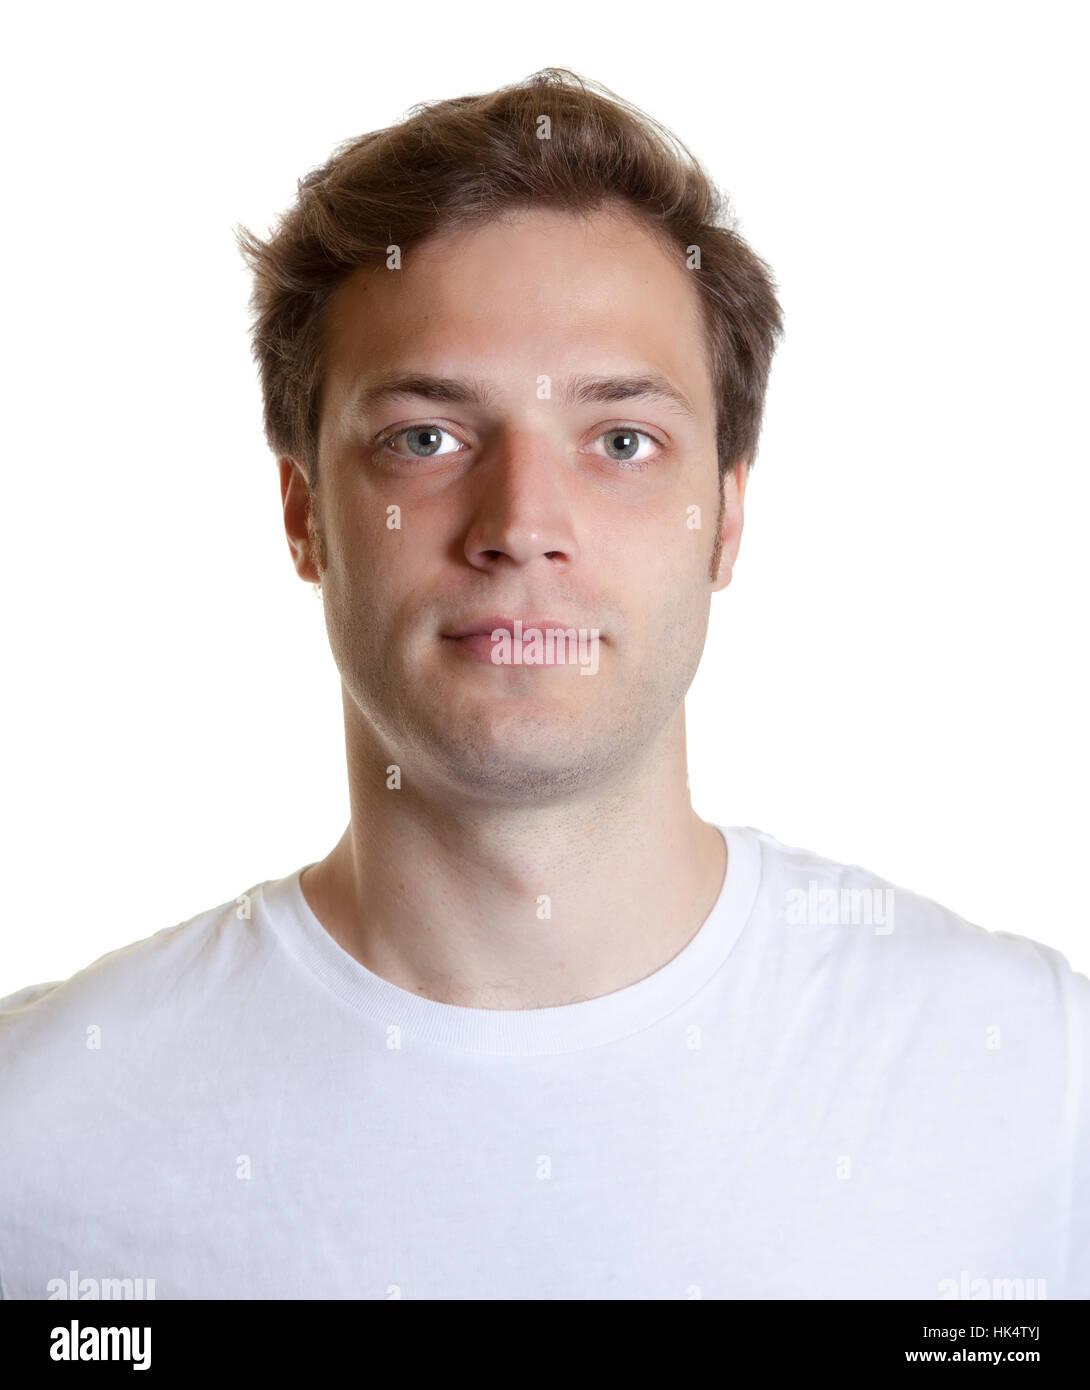 Portrait Passfoto Jung Jünger Foto Modell Modell Mann Kopf